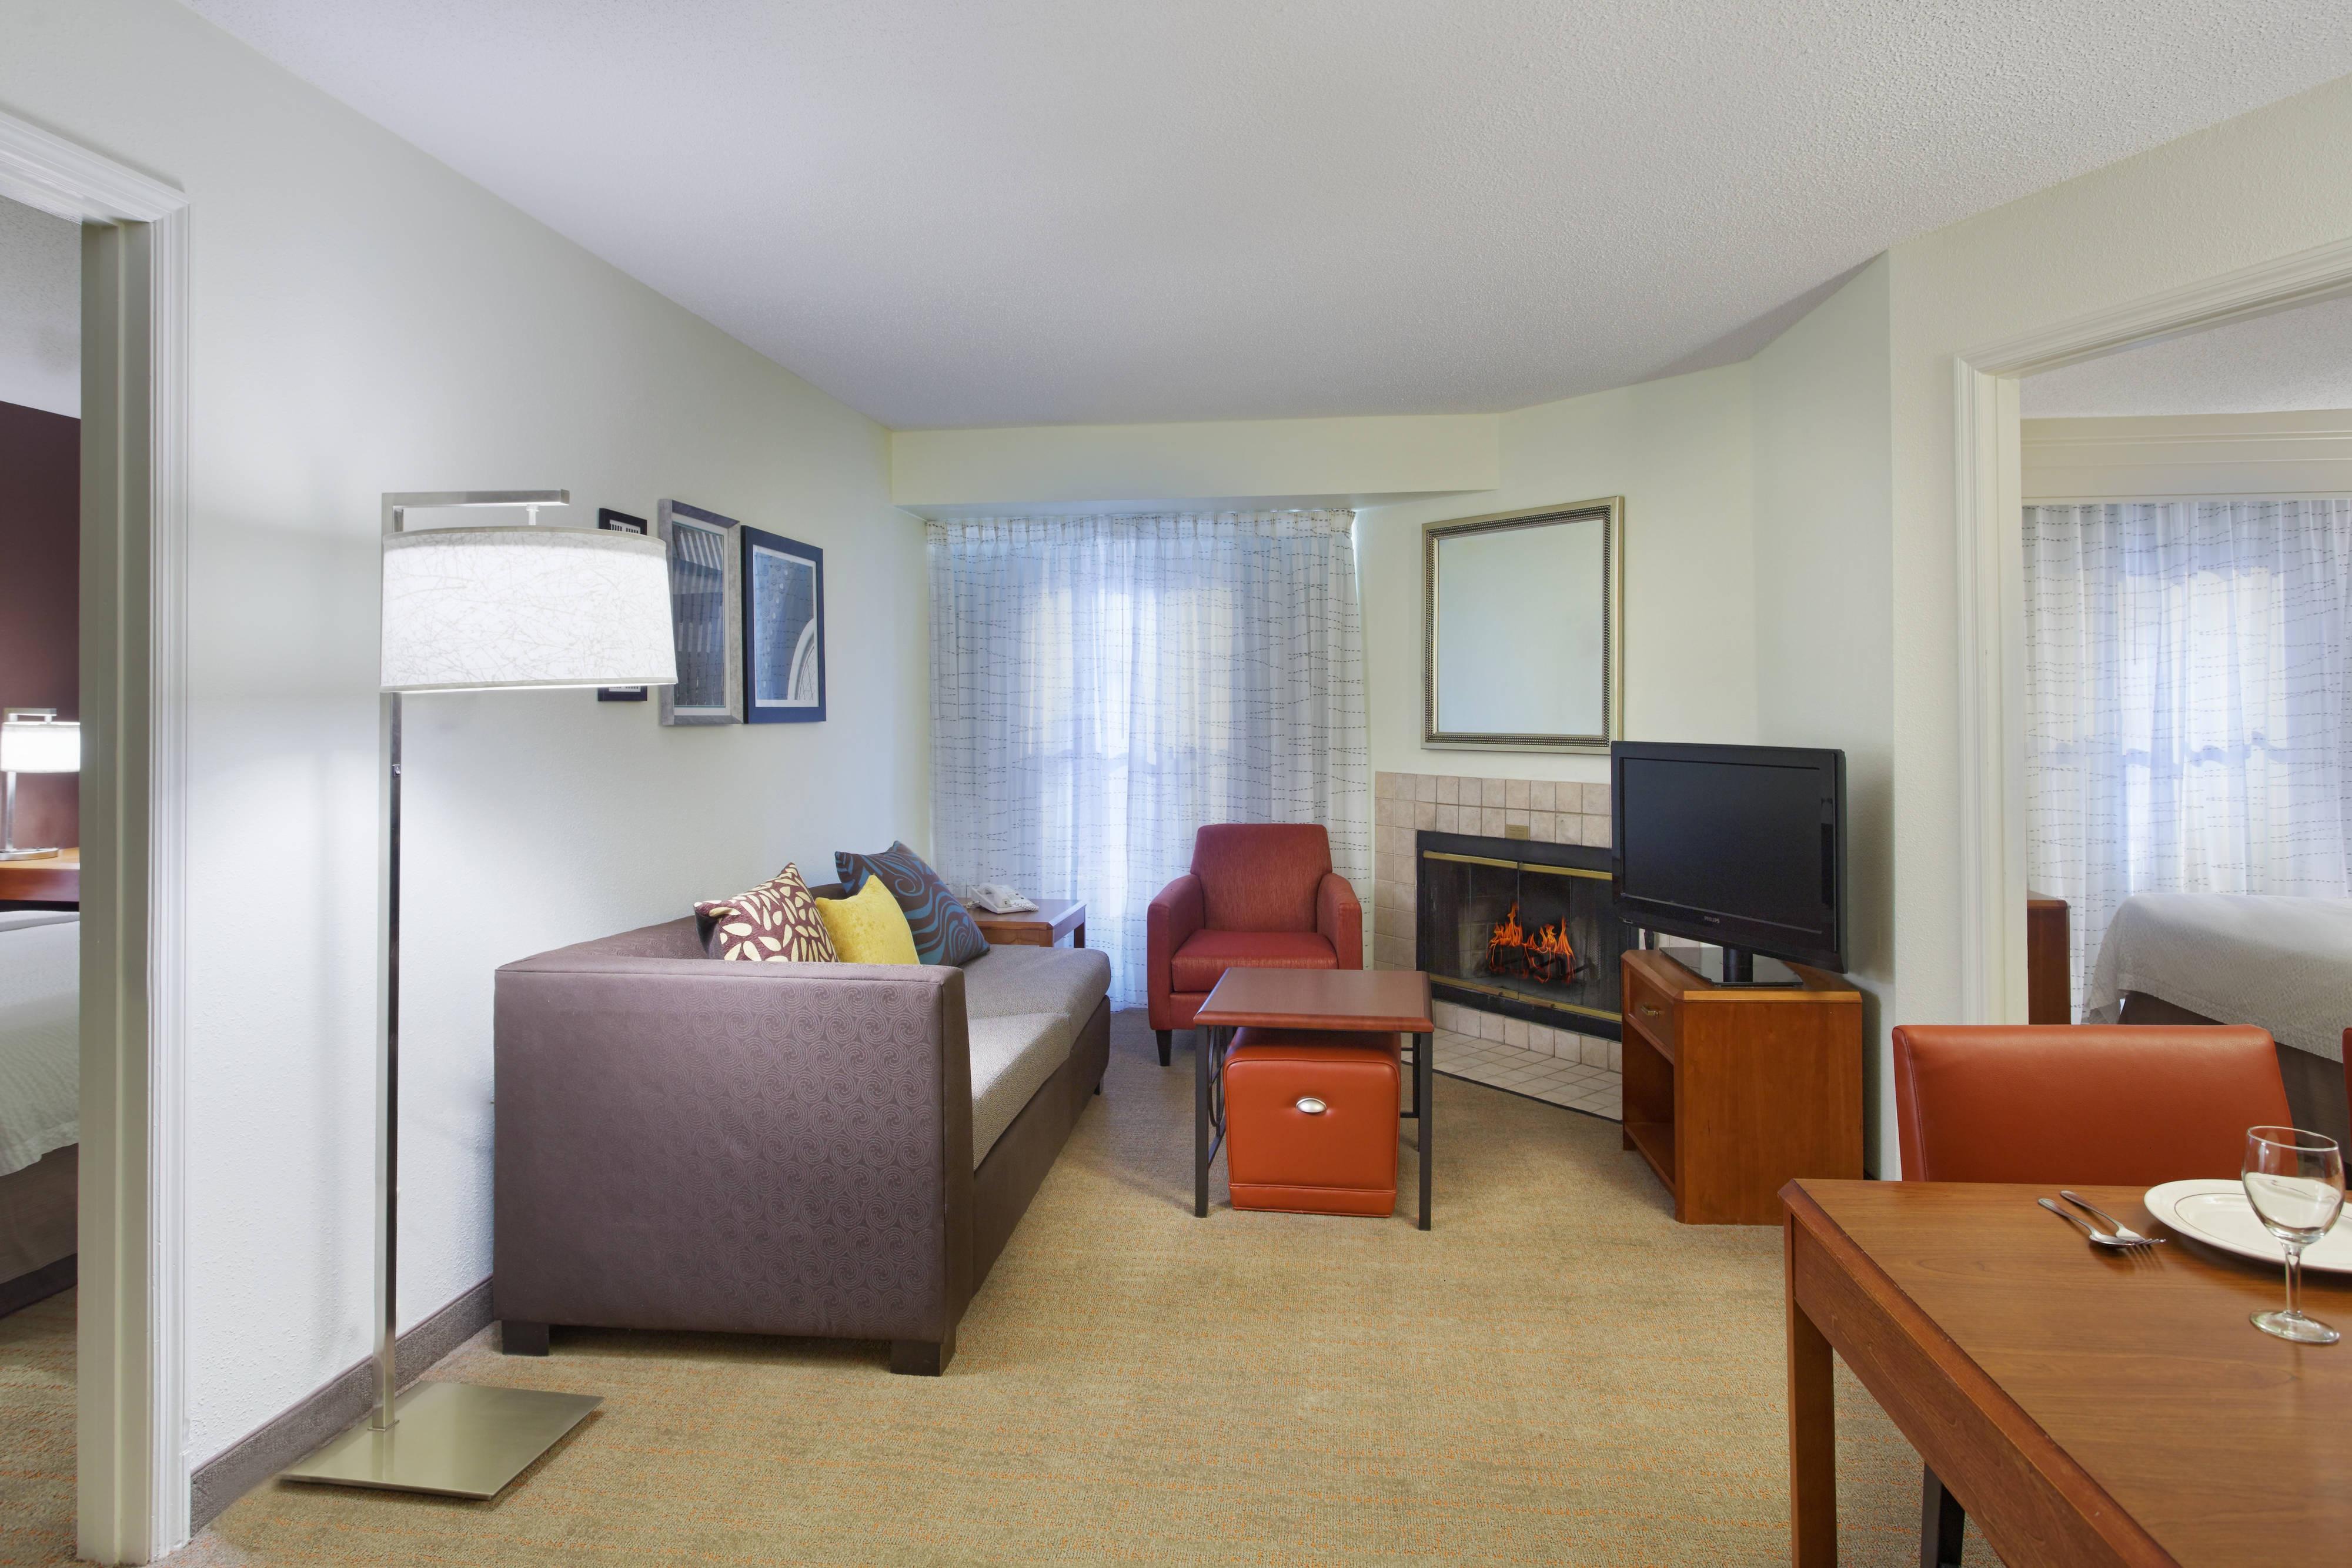 hotel suite in greenville sc